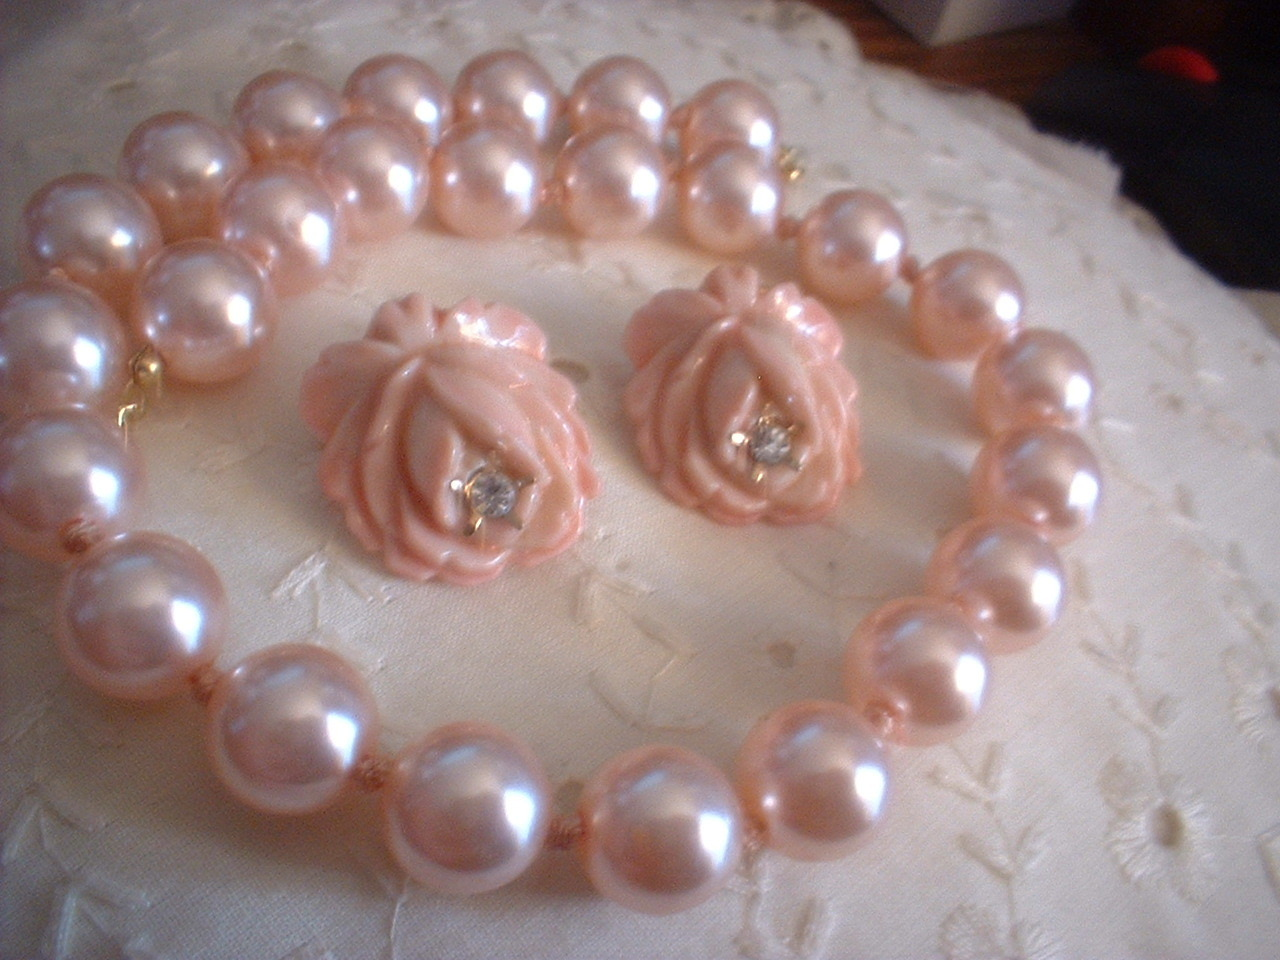 Plastic necklace rose earrings